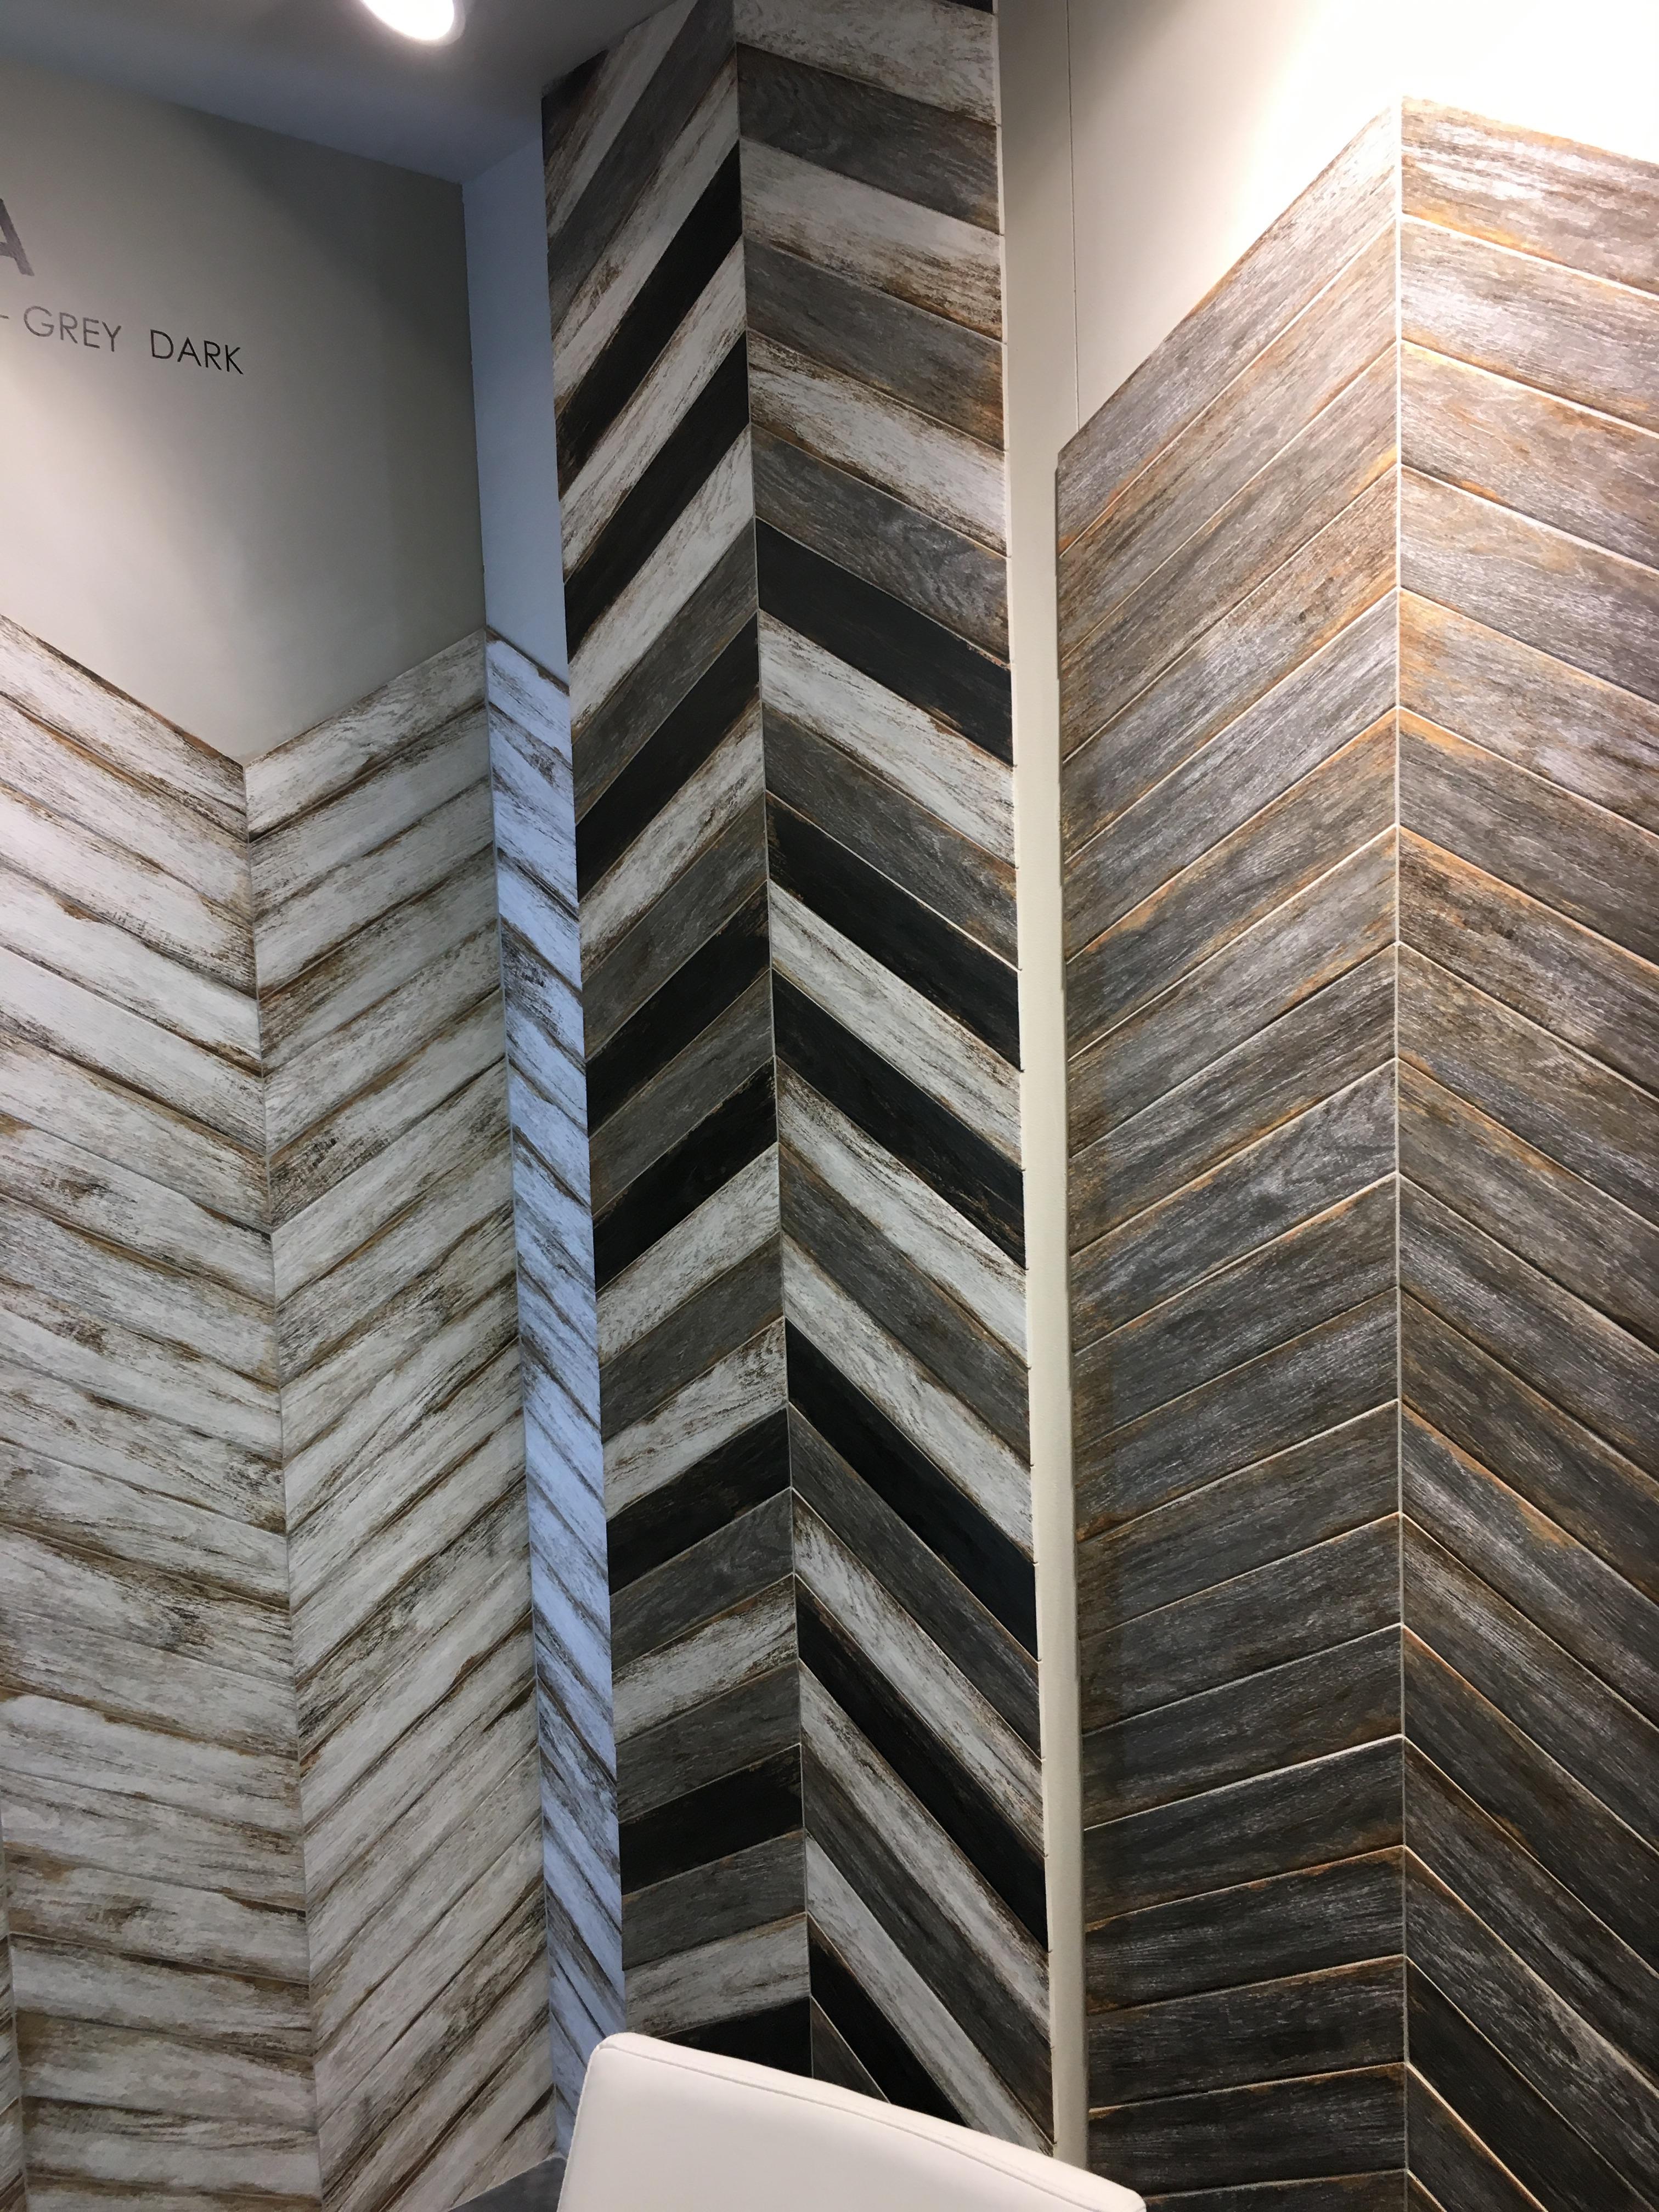 Maderas porcelánicas en Barcelona, Pavimentos de madera en cerámica